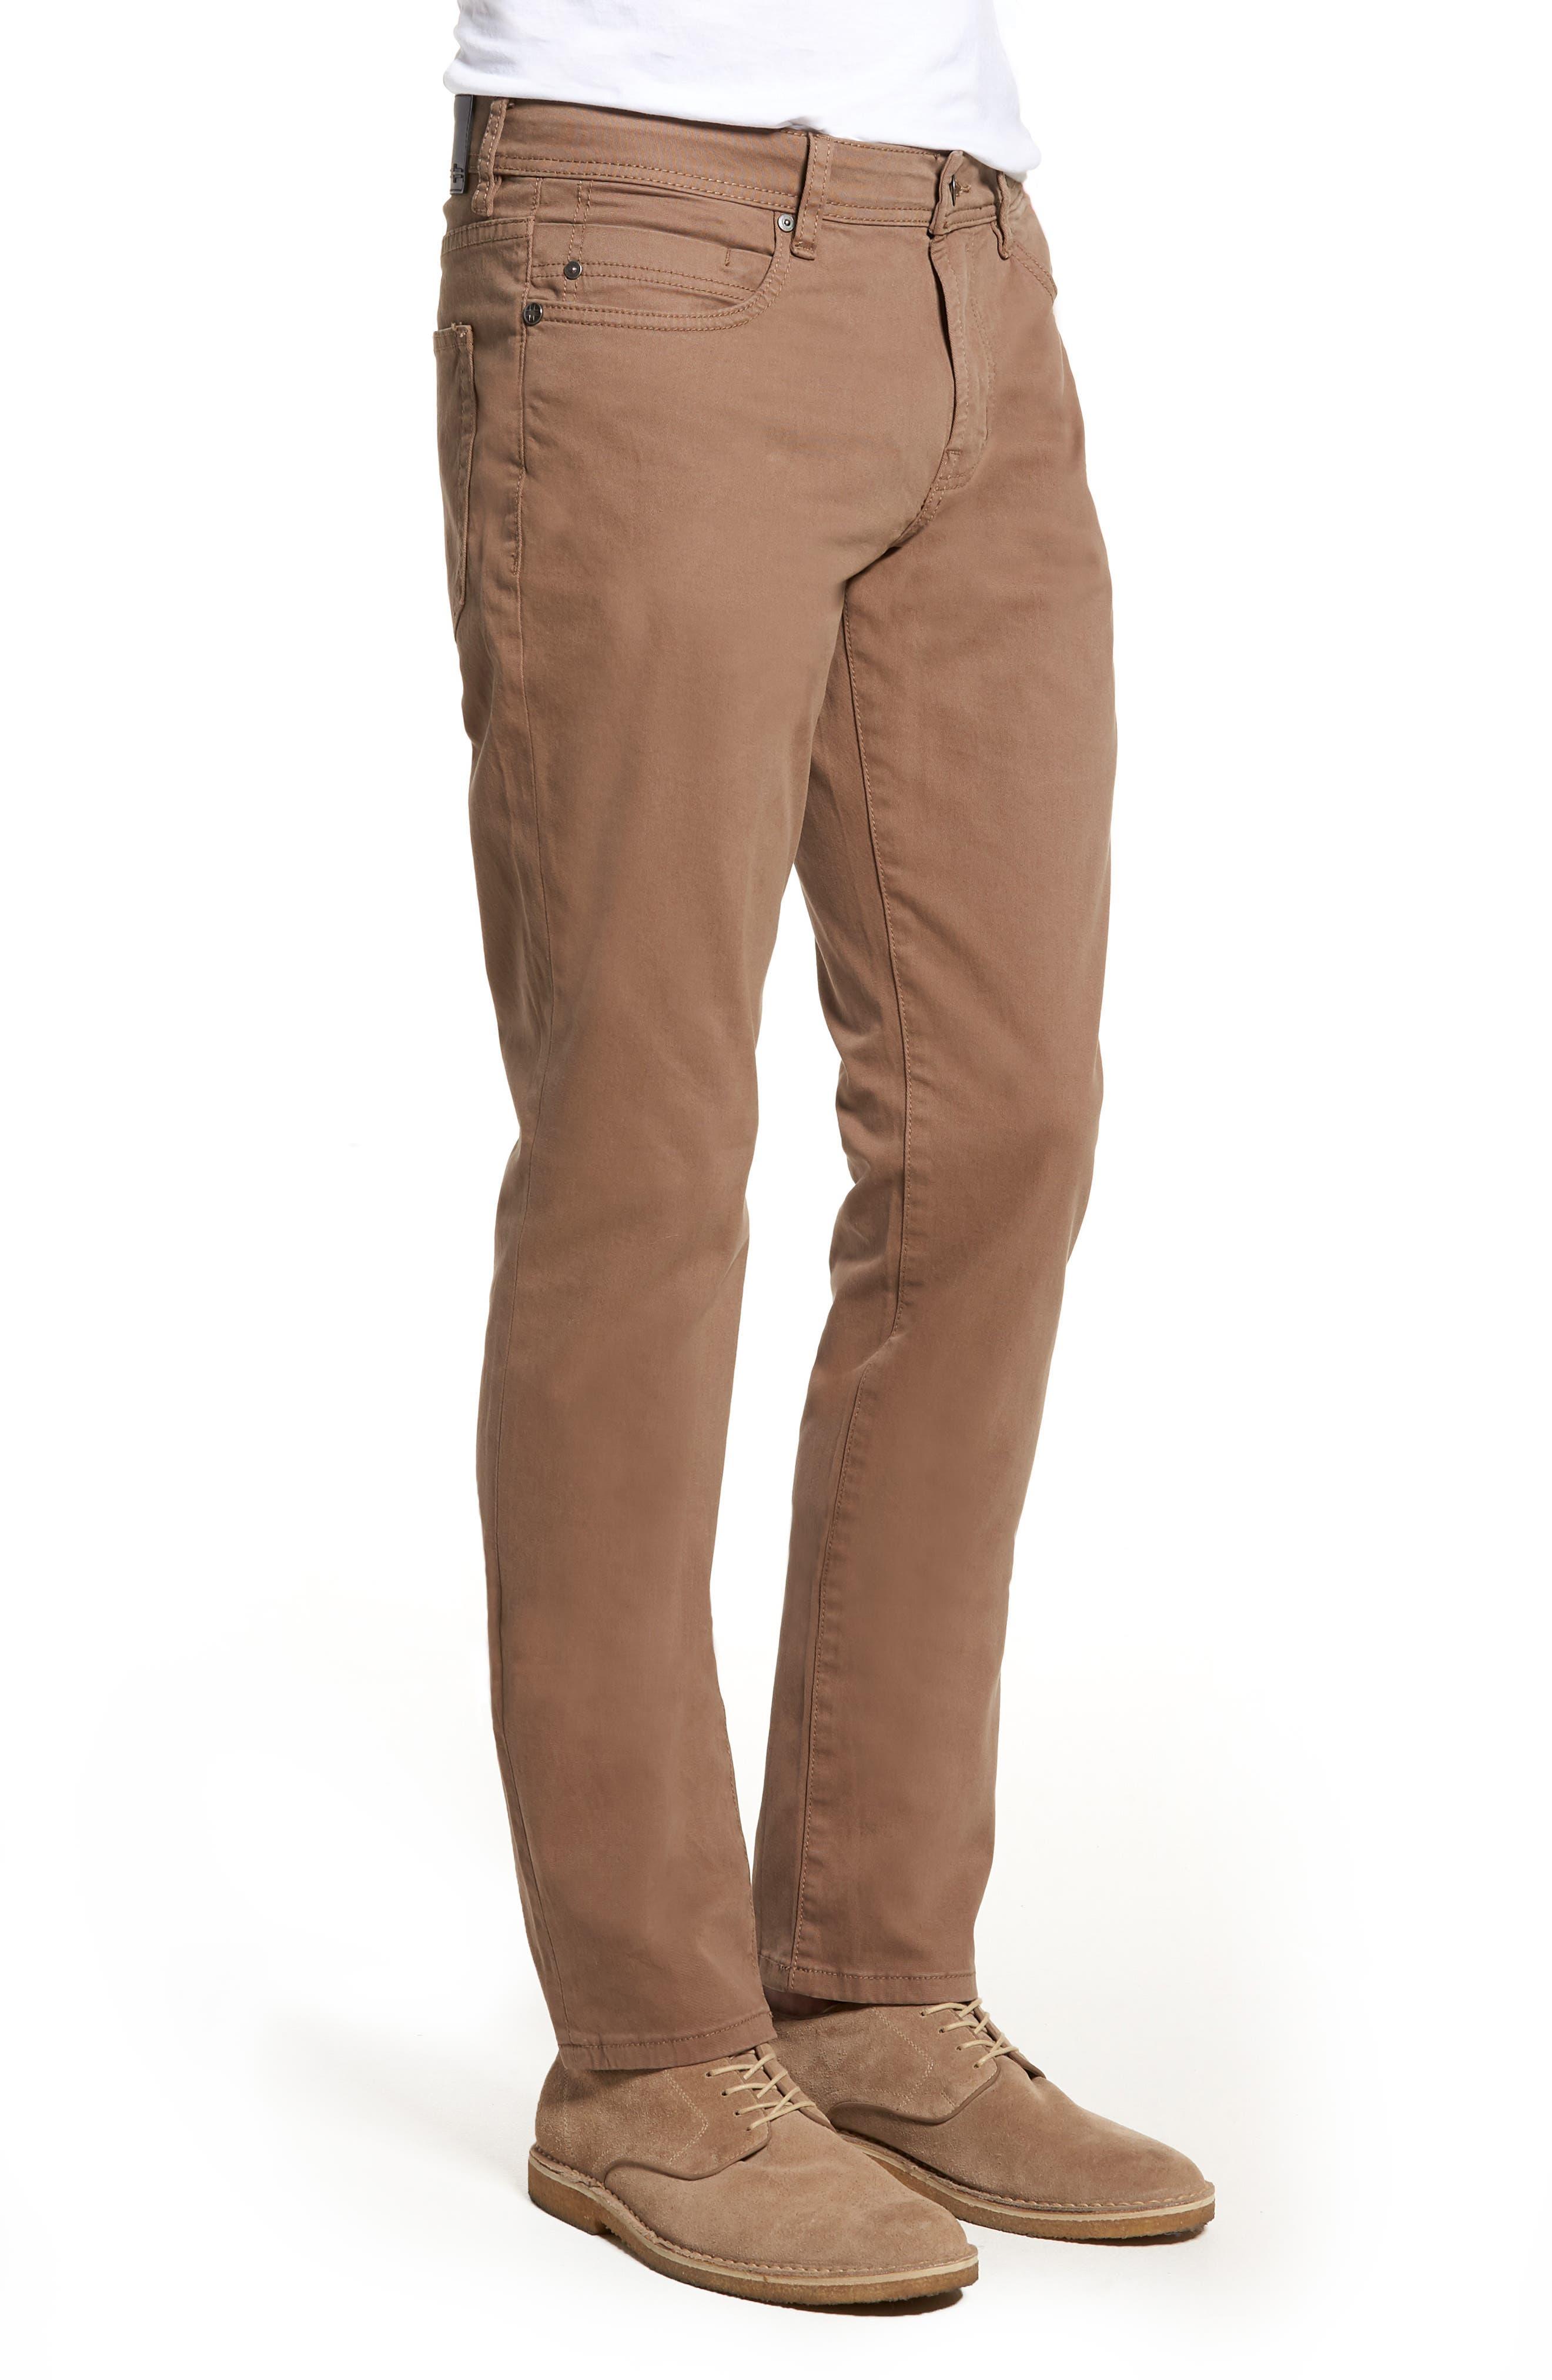 Jeans Co. Slim Straight Leg Jeans,                             Alternate thumbnail 3, color,                             Cub